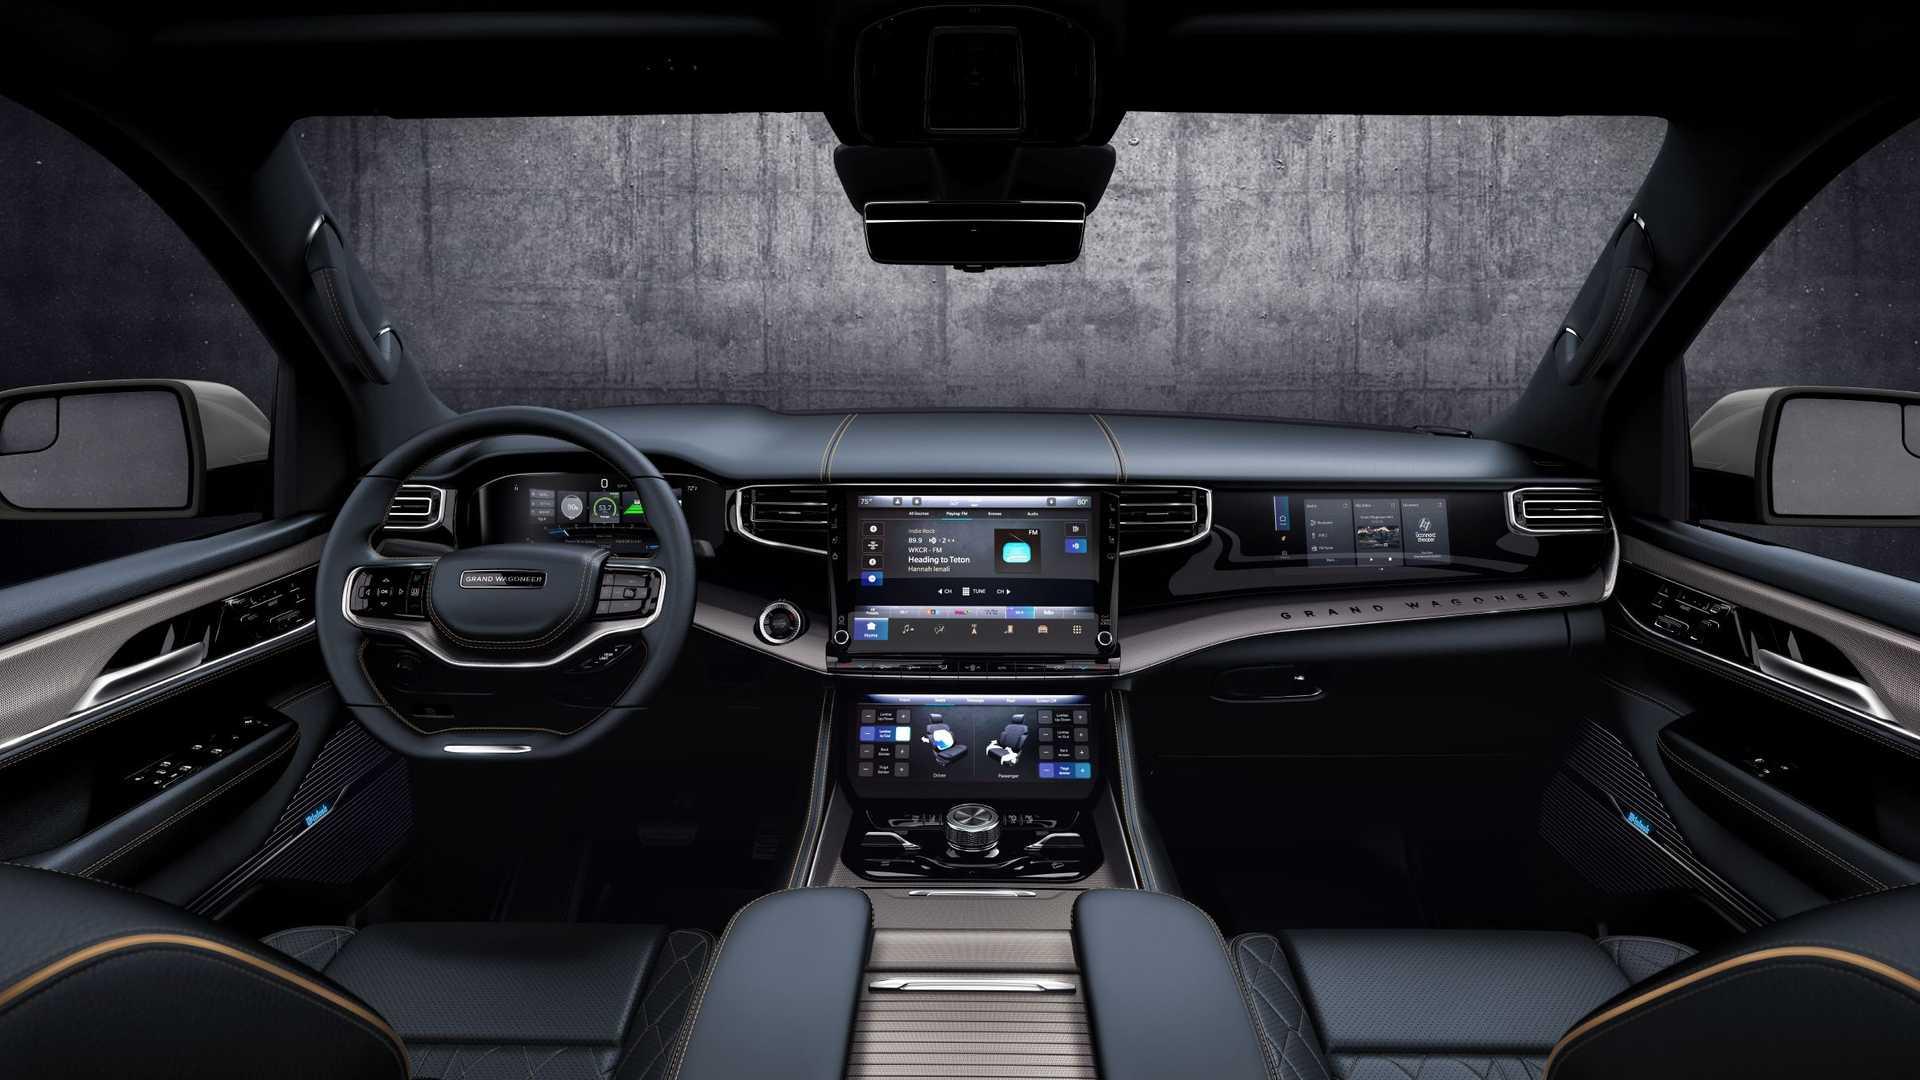 2022-jeep-grand-wagoneer-interior-dashboard-2